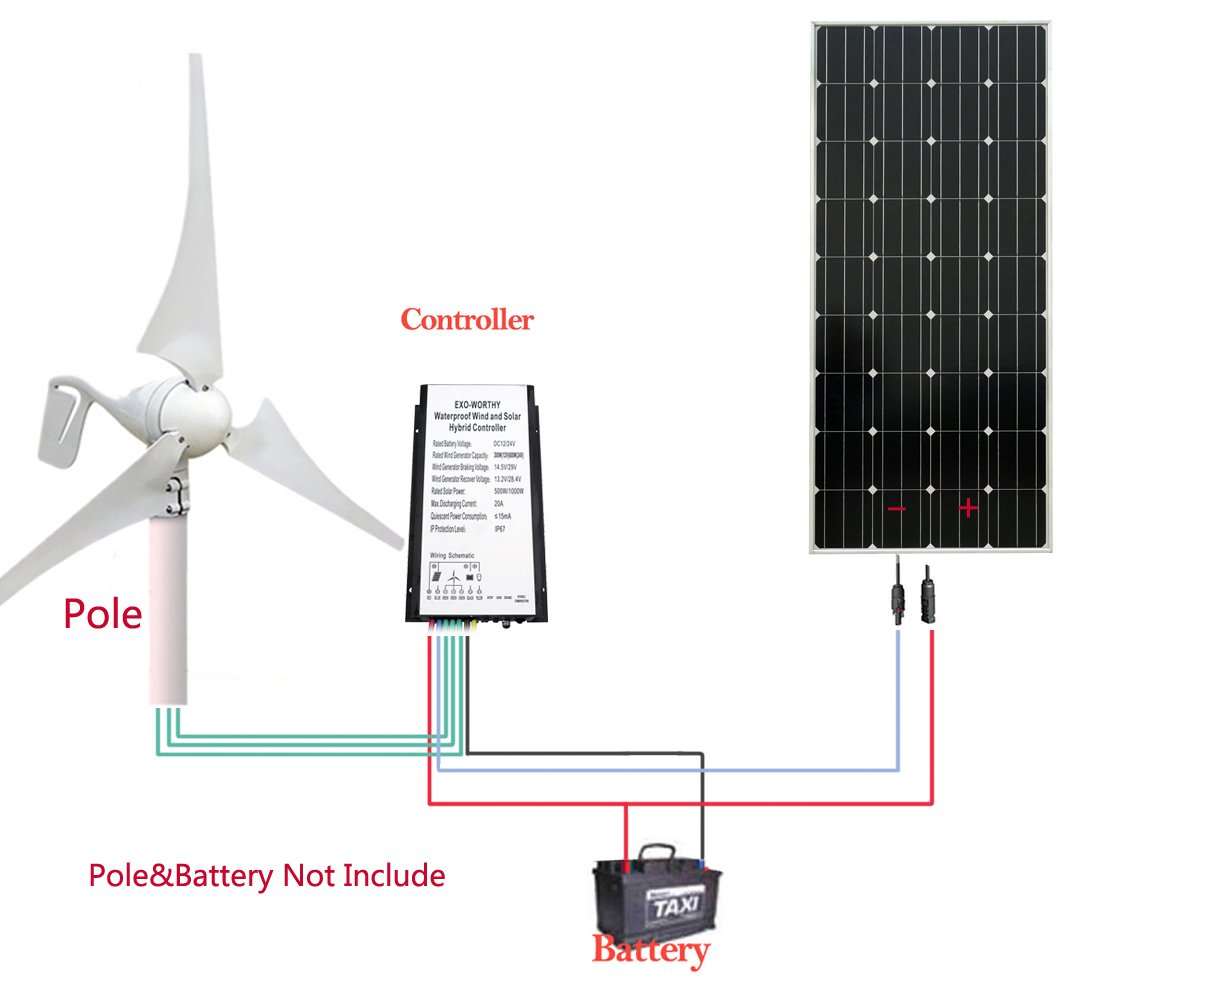 12v 560w Wind Solar Hybrid System 400w Generator With Power Wiring Diagram Controller 160w Monocrystalline Panel Garden Outdoors